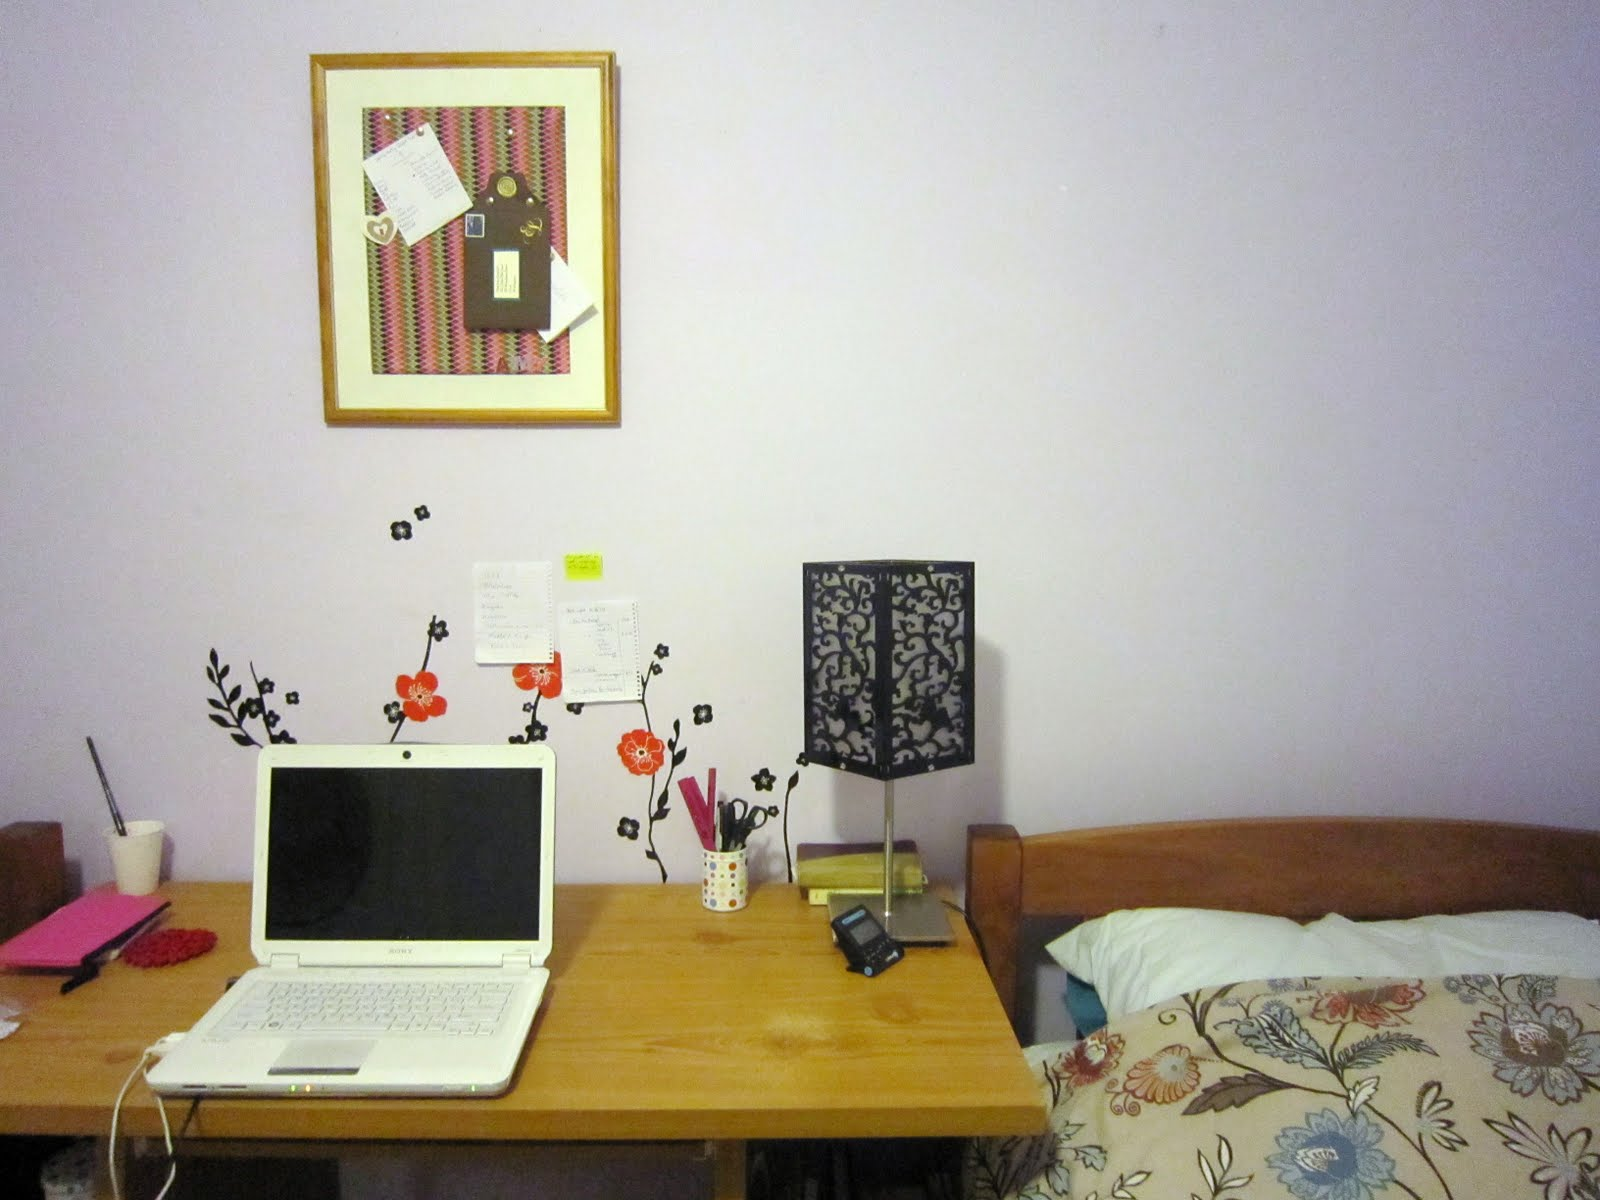 http://2.bp.blogspot.com/-BAyaVOABCXY/TjSBJ_4wdfI/AAAAAAAABys/LQZLBhcgOVE/s1600/IMG_7920.JPG